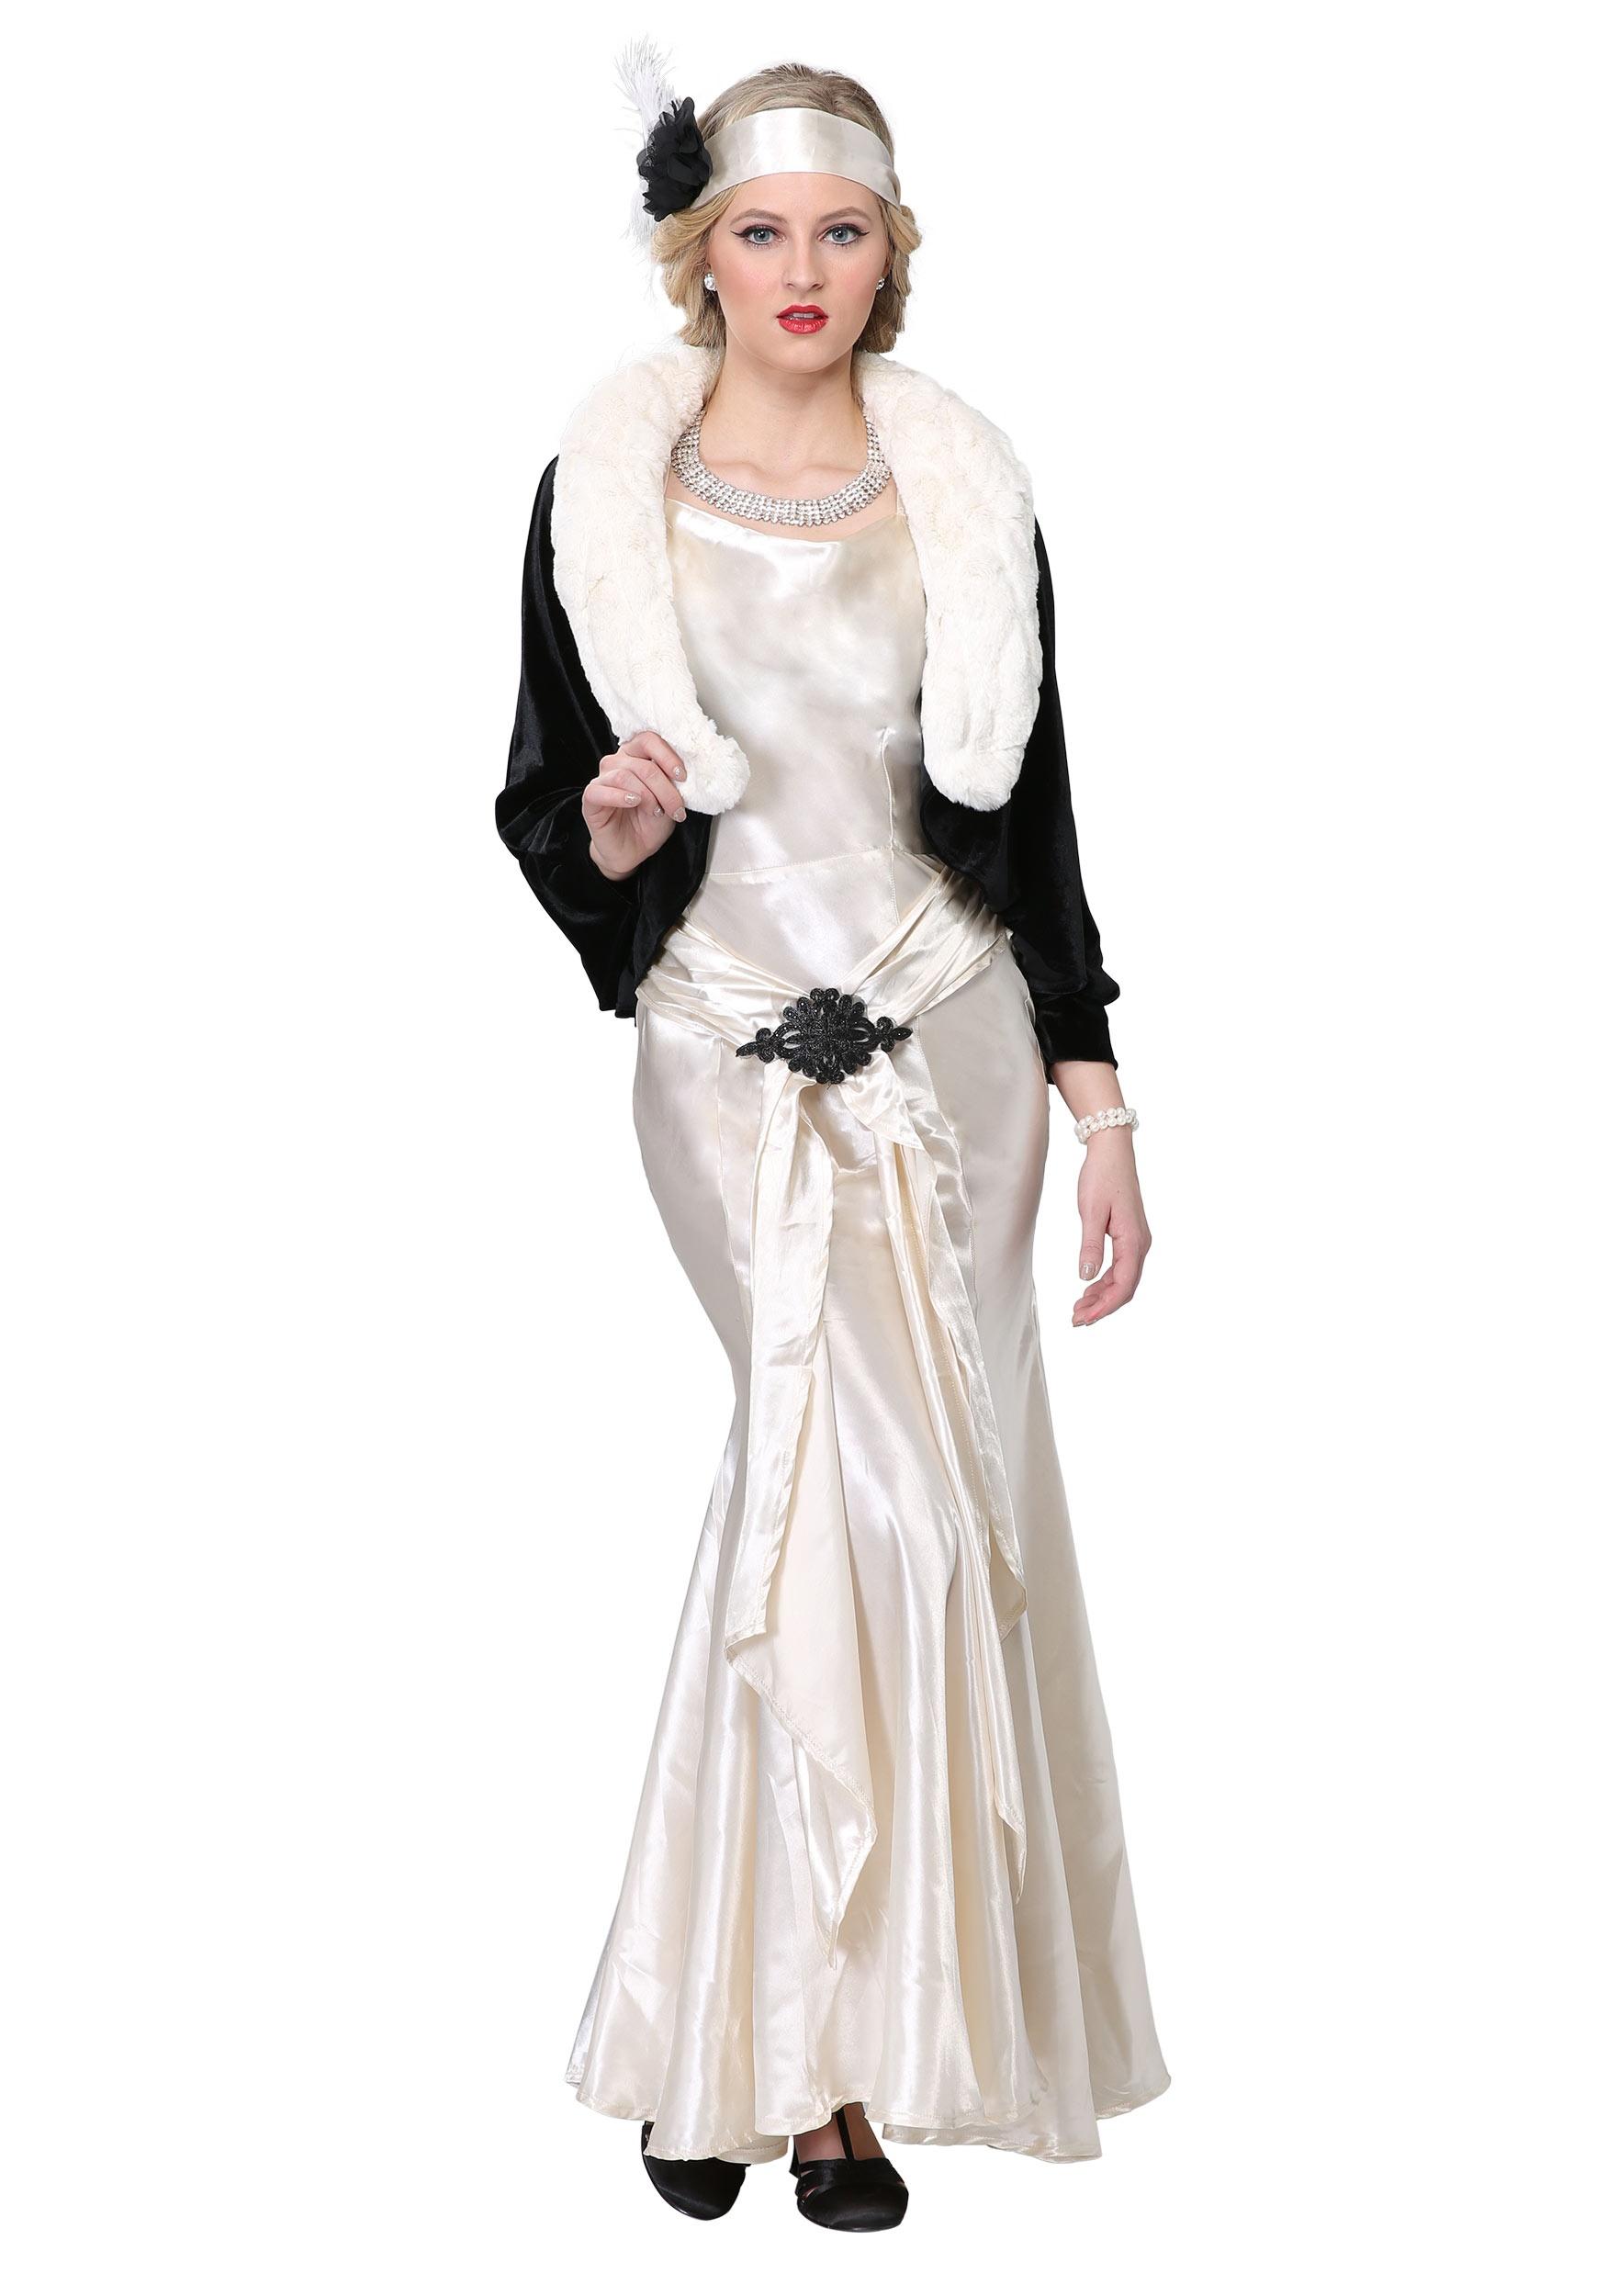 1920s Socialite Plus Size Costume For Women